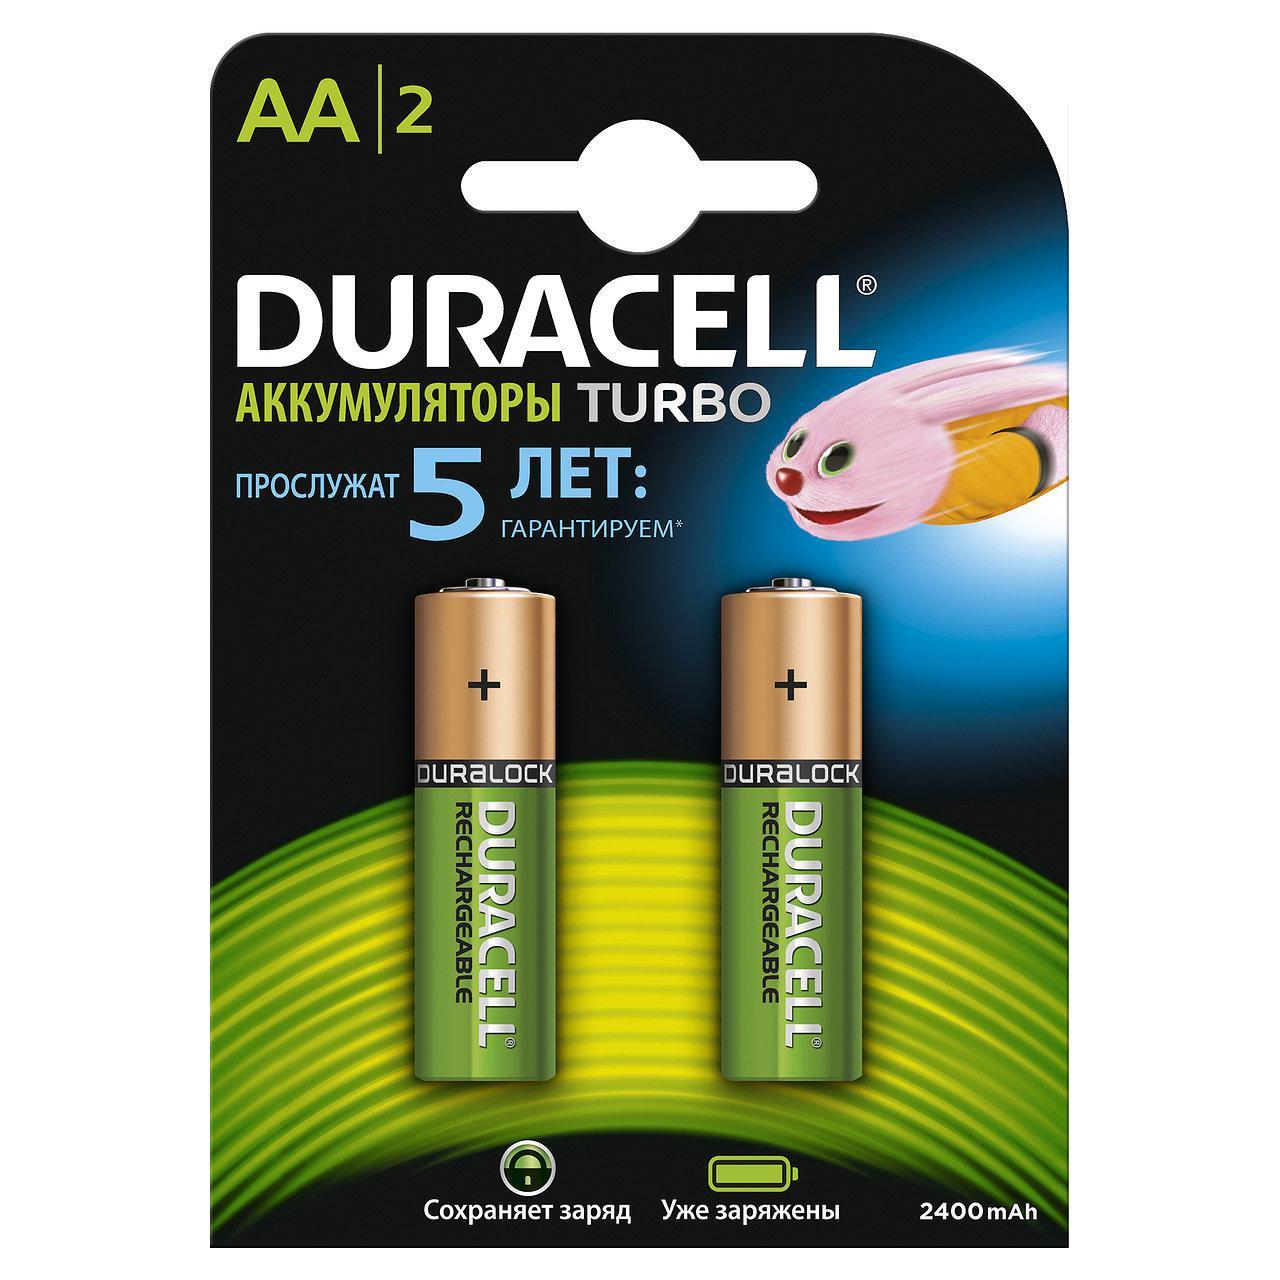 Аккумулятор Duracell Hr6-2bl (2/20) 2400mah 2шт duracell lr6 2bl turbo 2шт aa